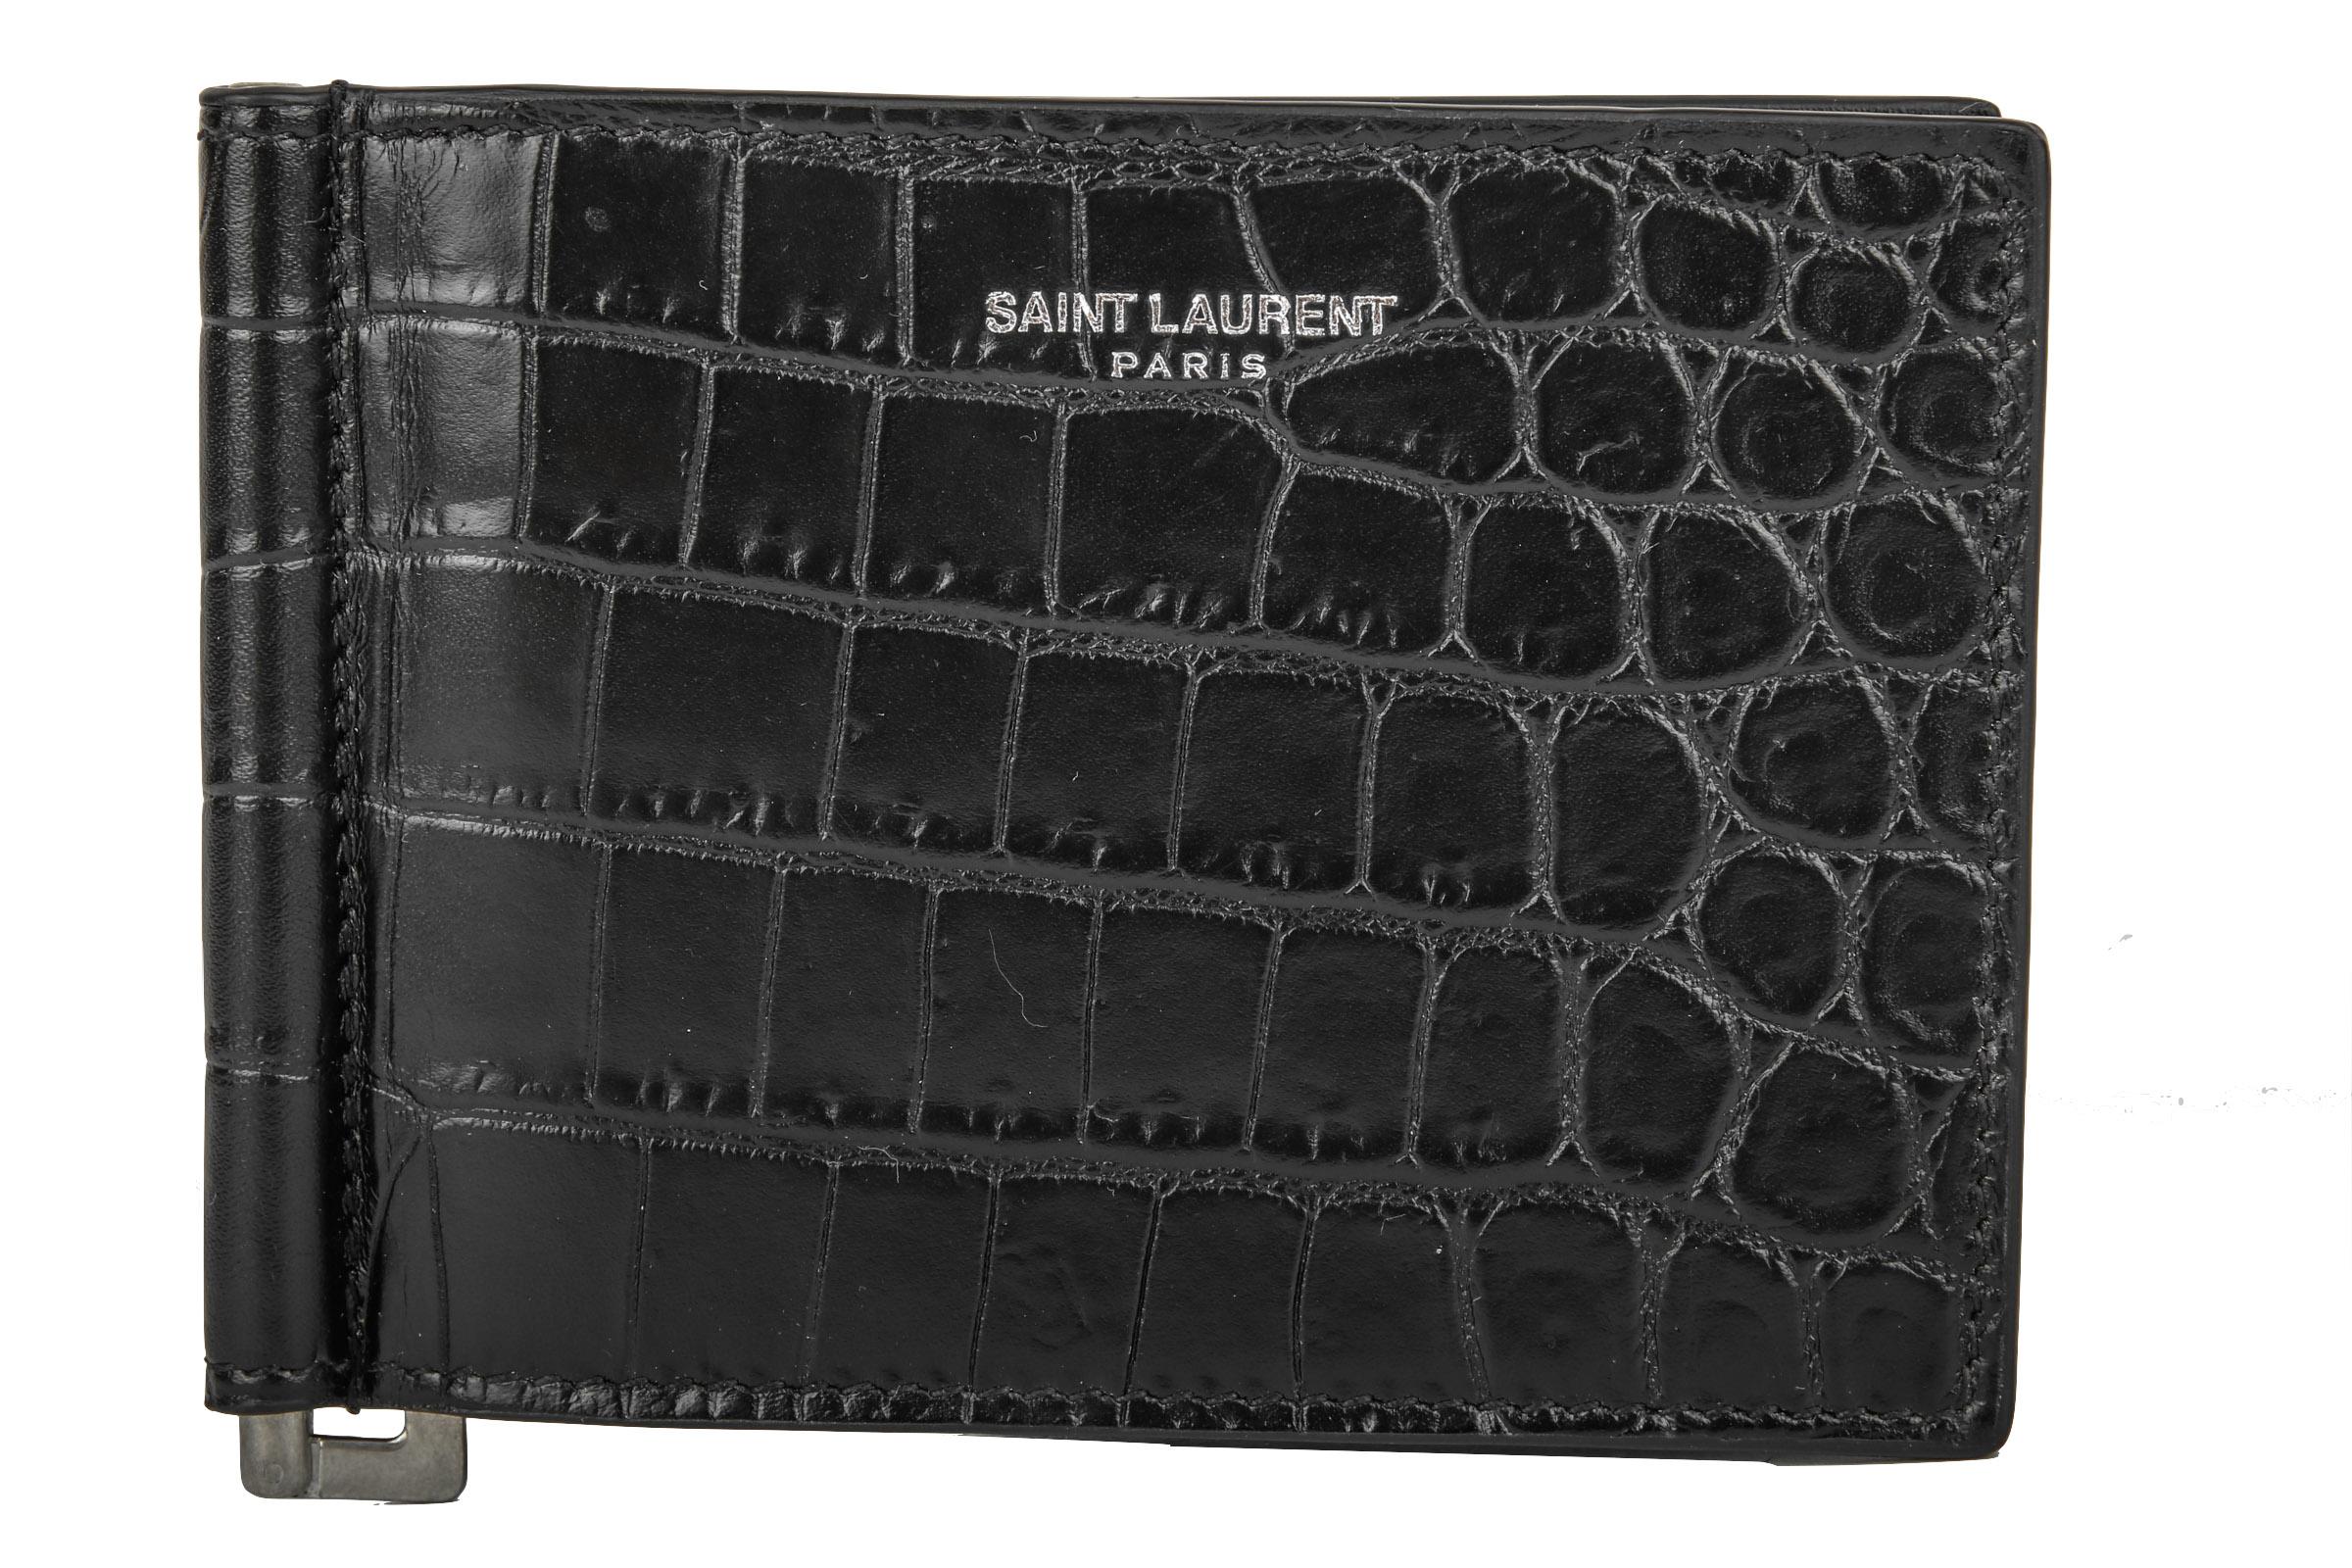 97222d5b911 Saint Laurent Handbags & Accessories   Luxussachen.com